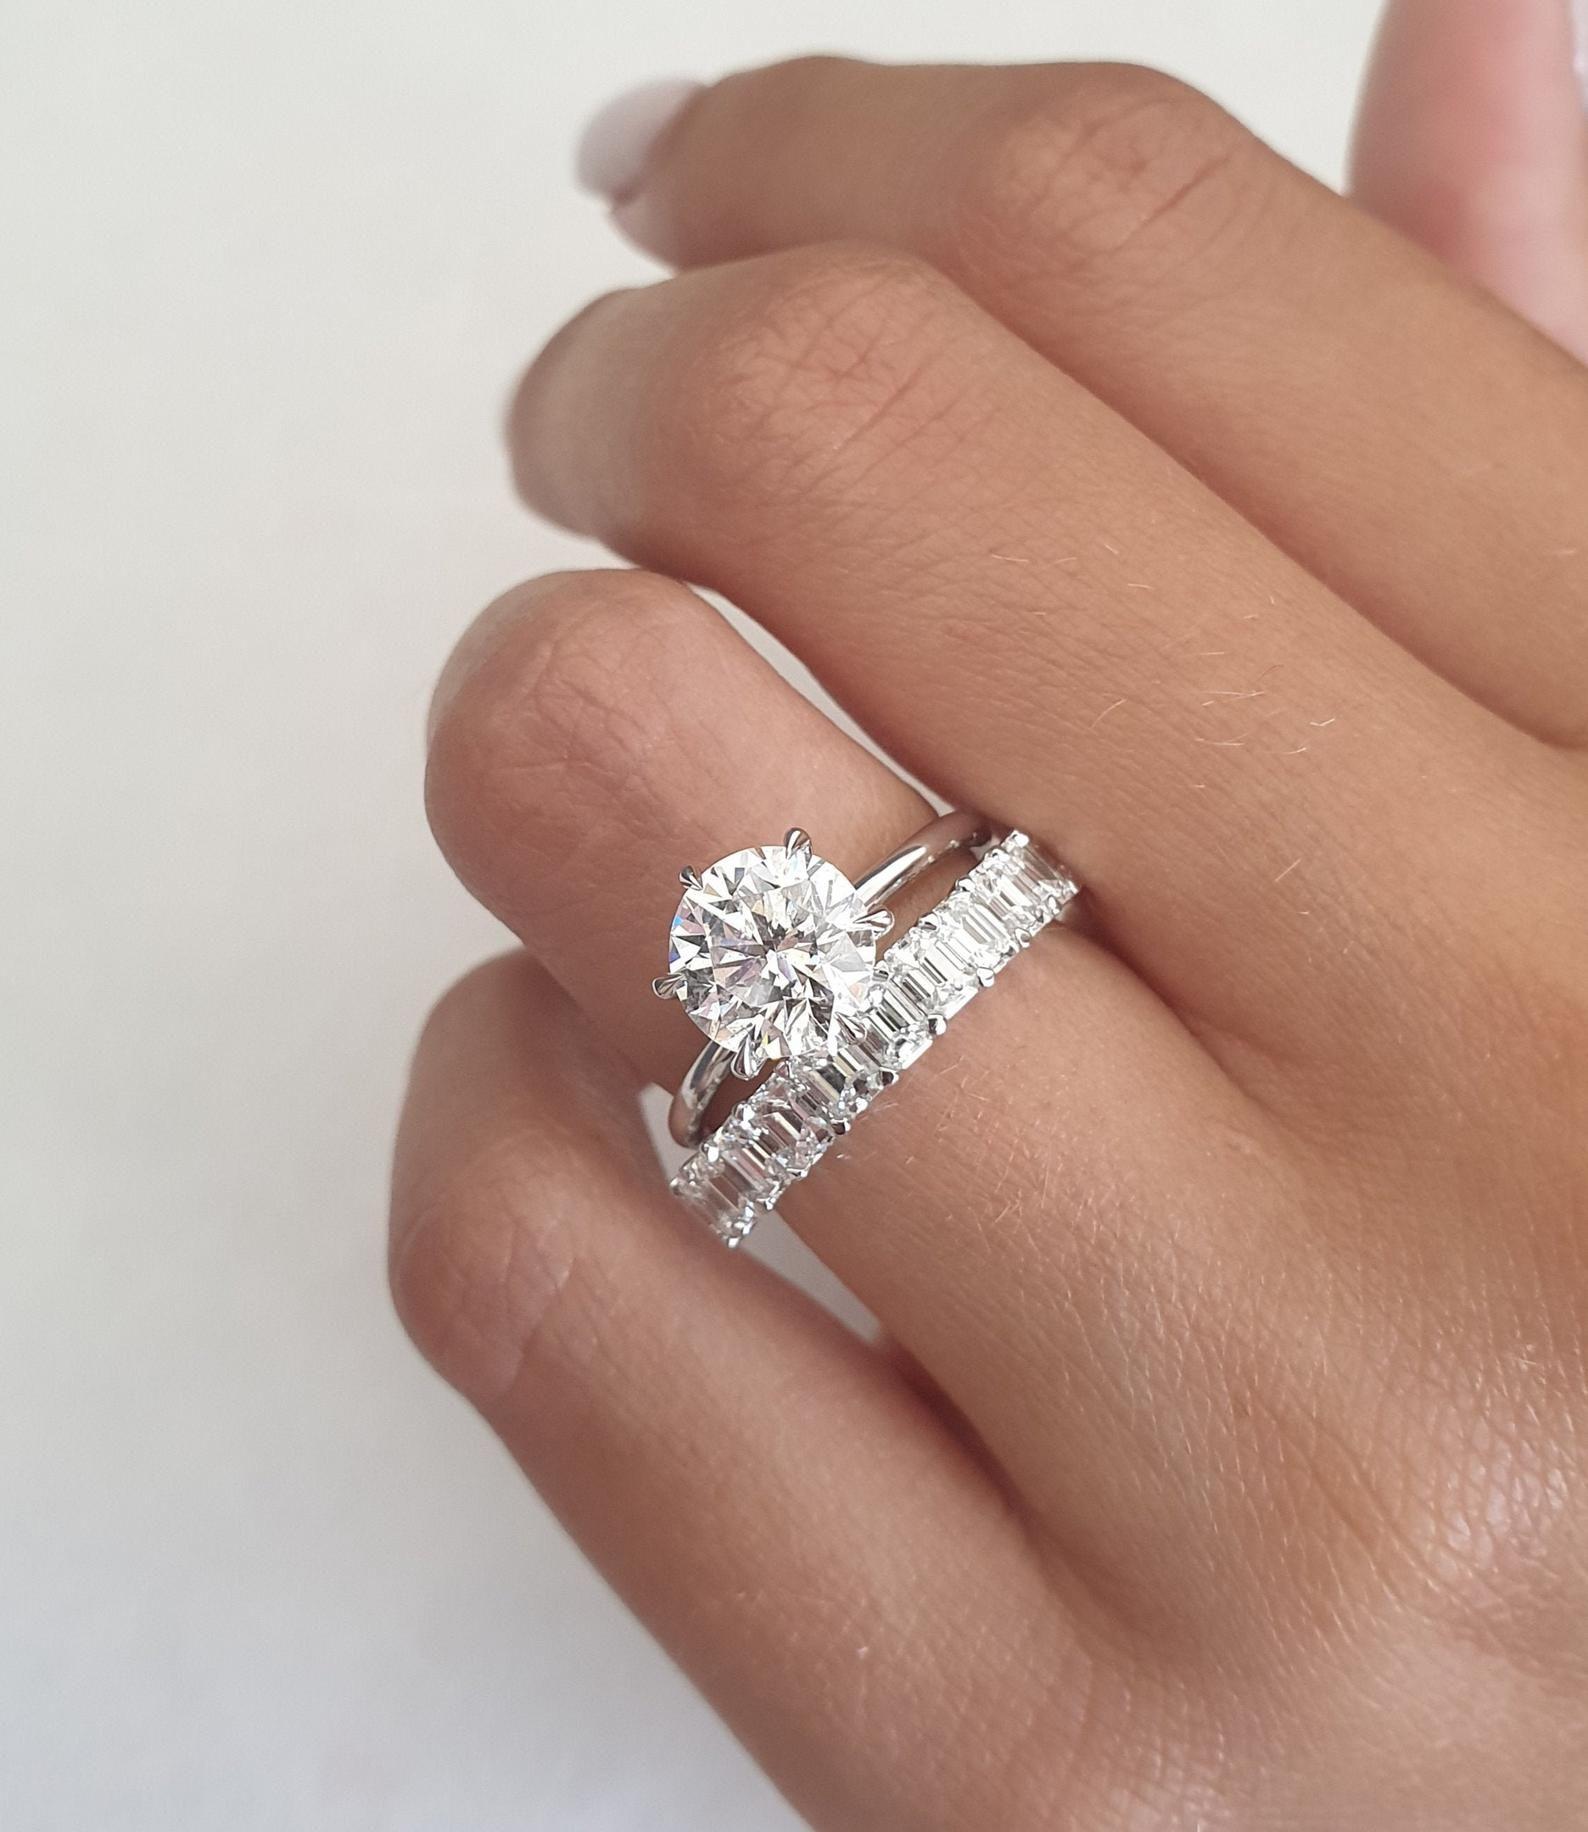 Rose Gold Man Made Diamond Engagement Ring 8mm Round Cut Wedding Ring Brilliant Cut Diamond Simulants Women Bridal Ring Anniversary Gift